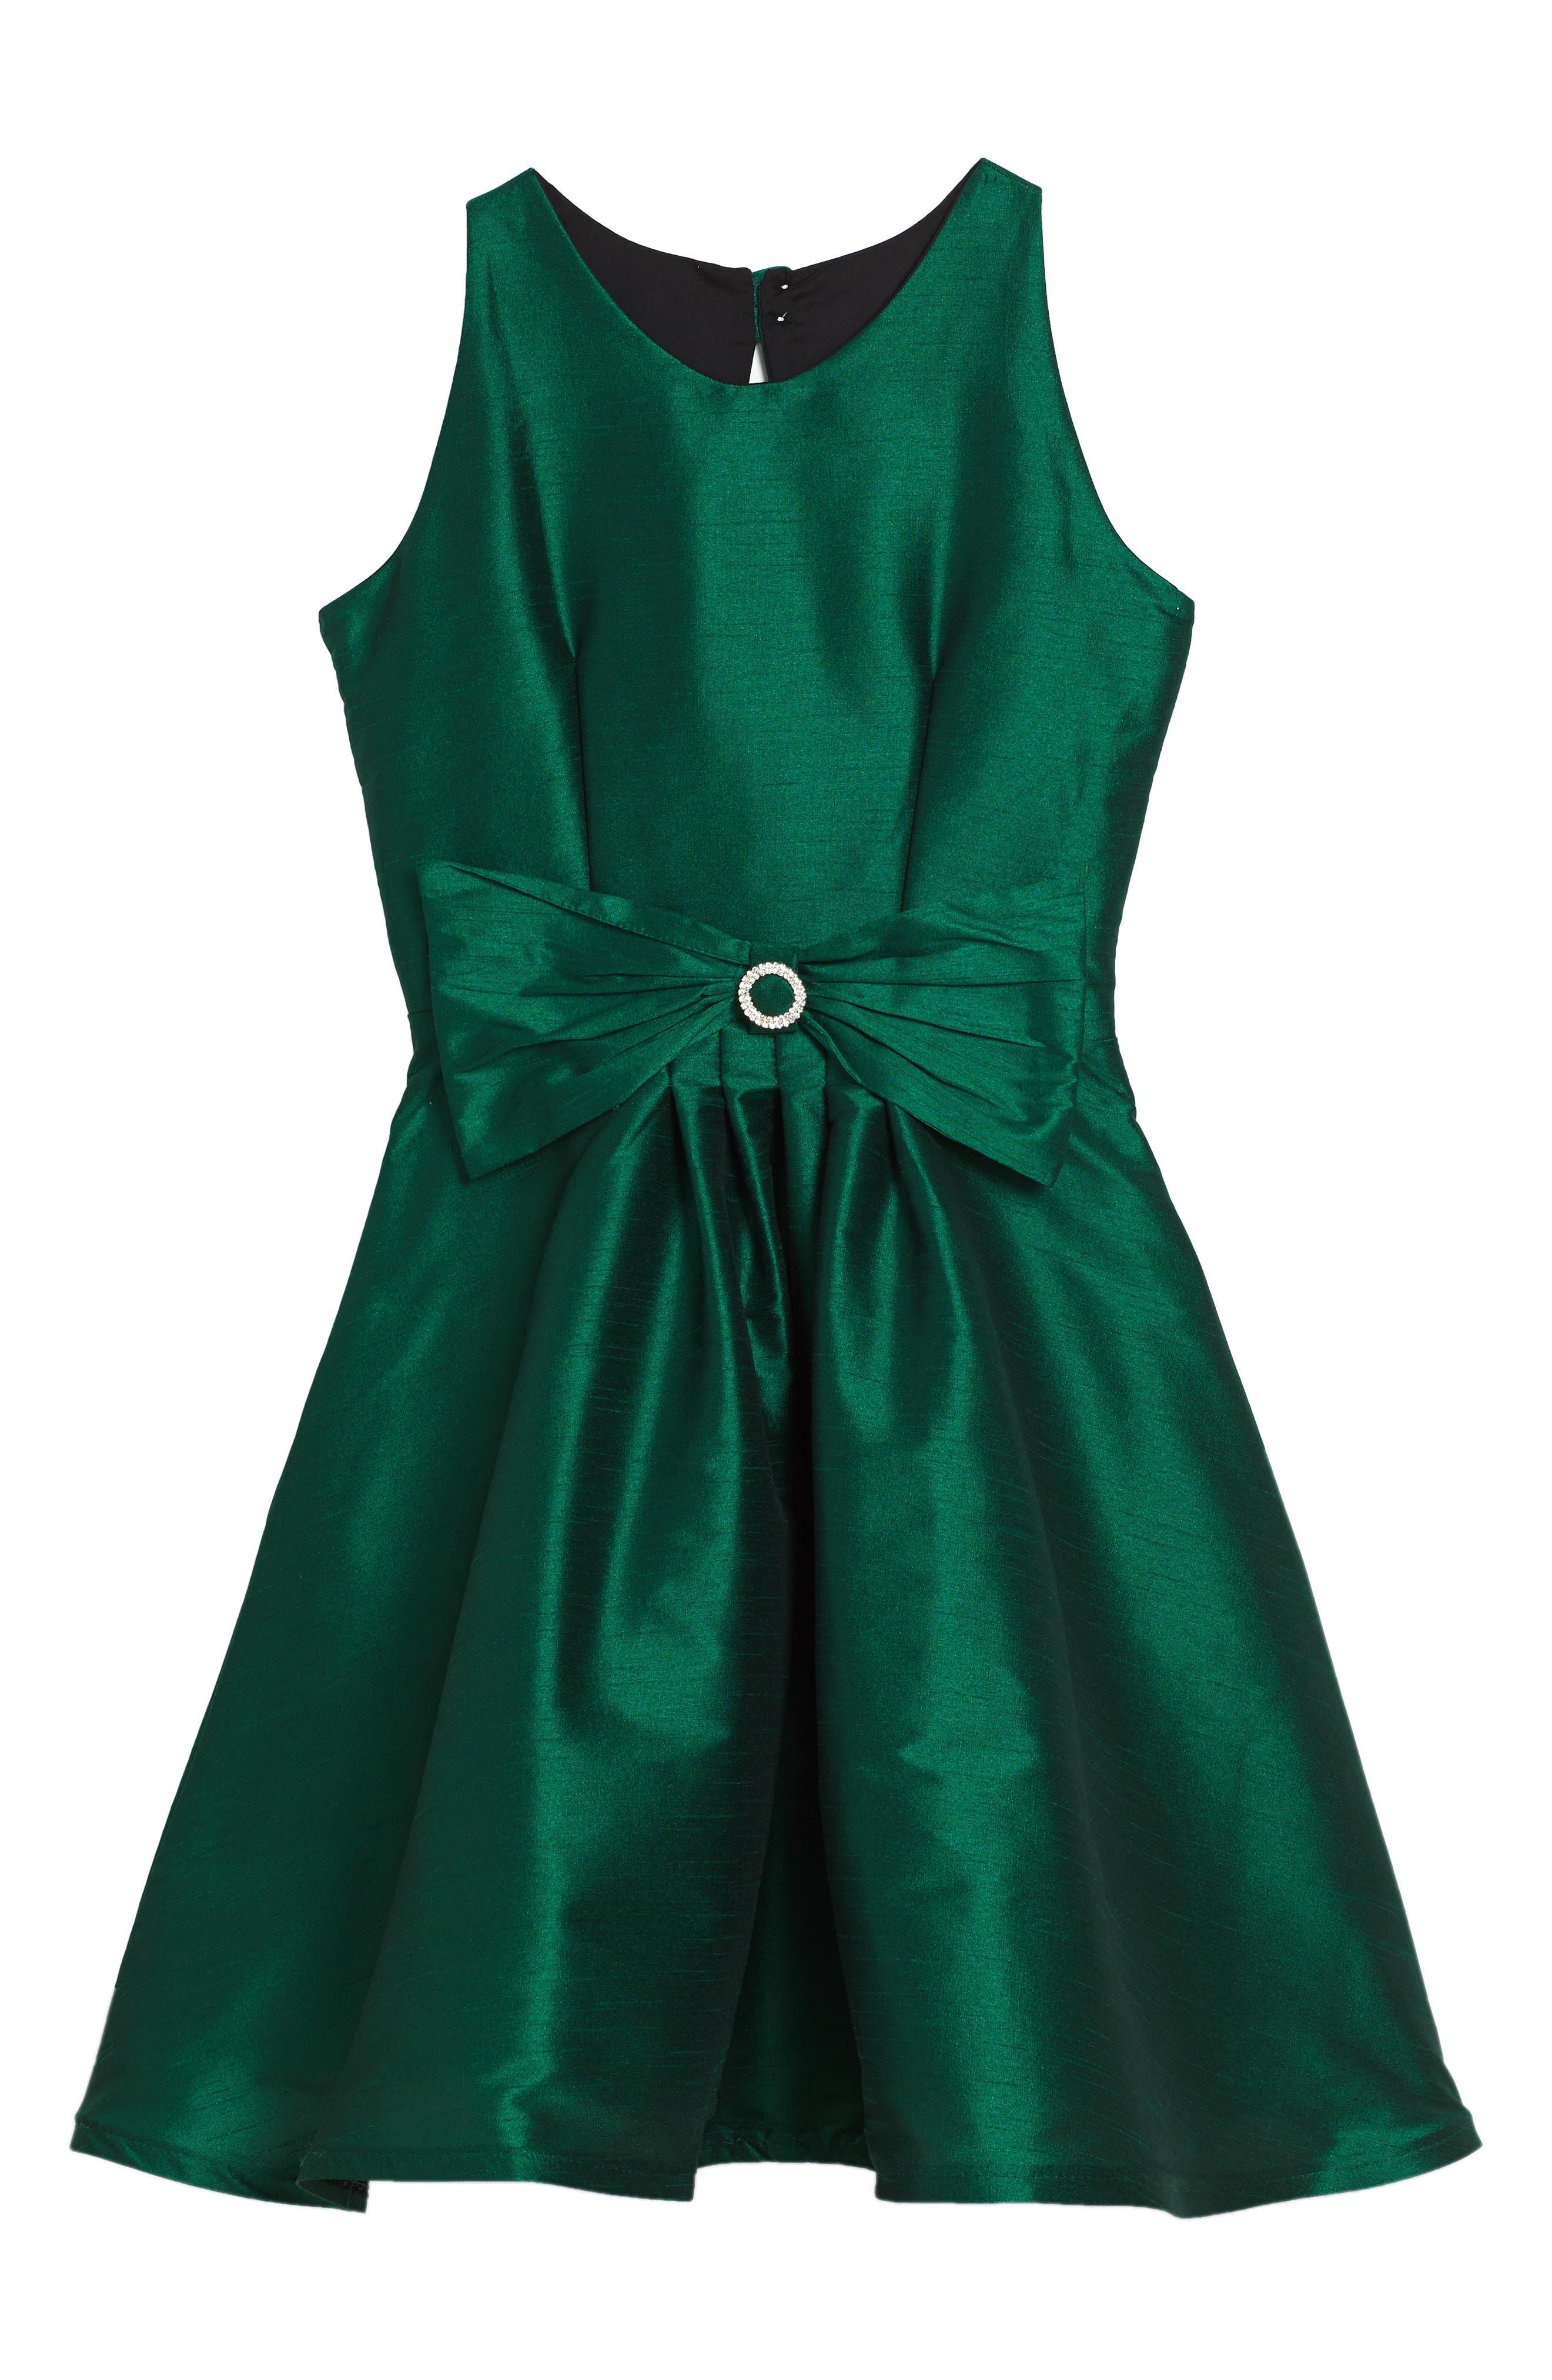 Main Image - Fiveloaves Twofish Holiday Beauty Sleeveless Dress (Big Girls)